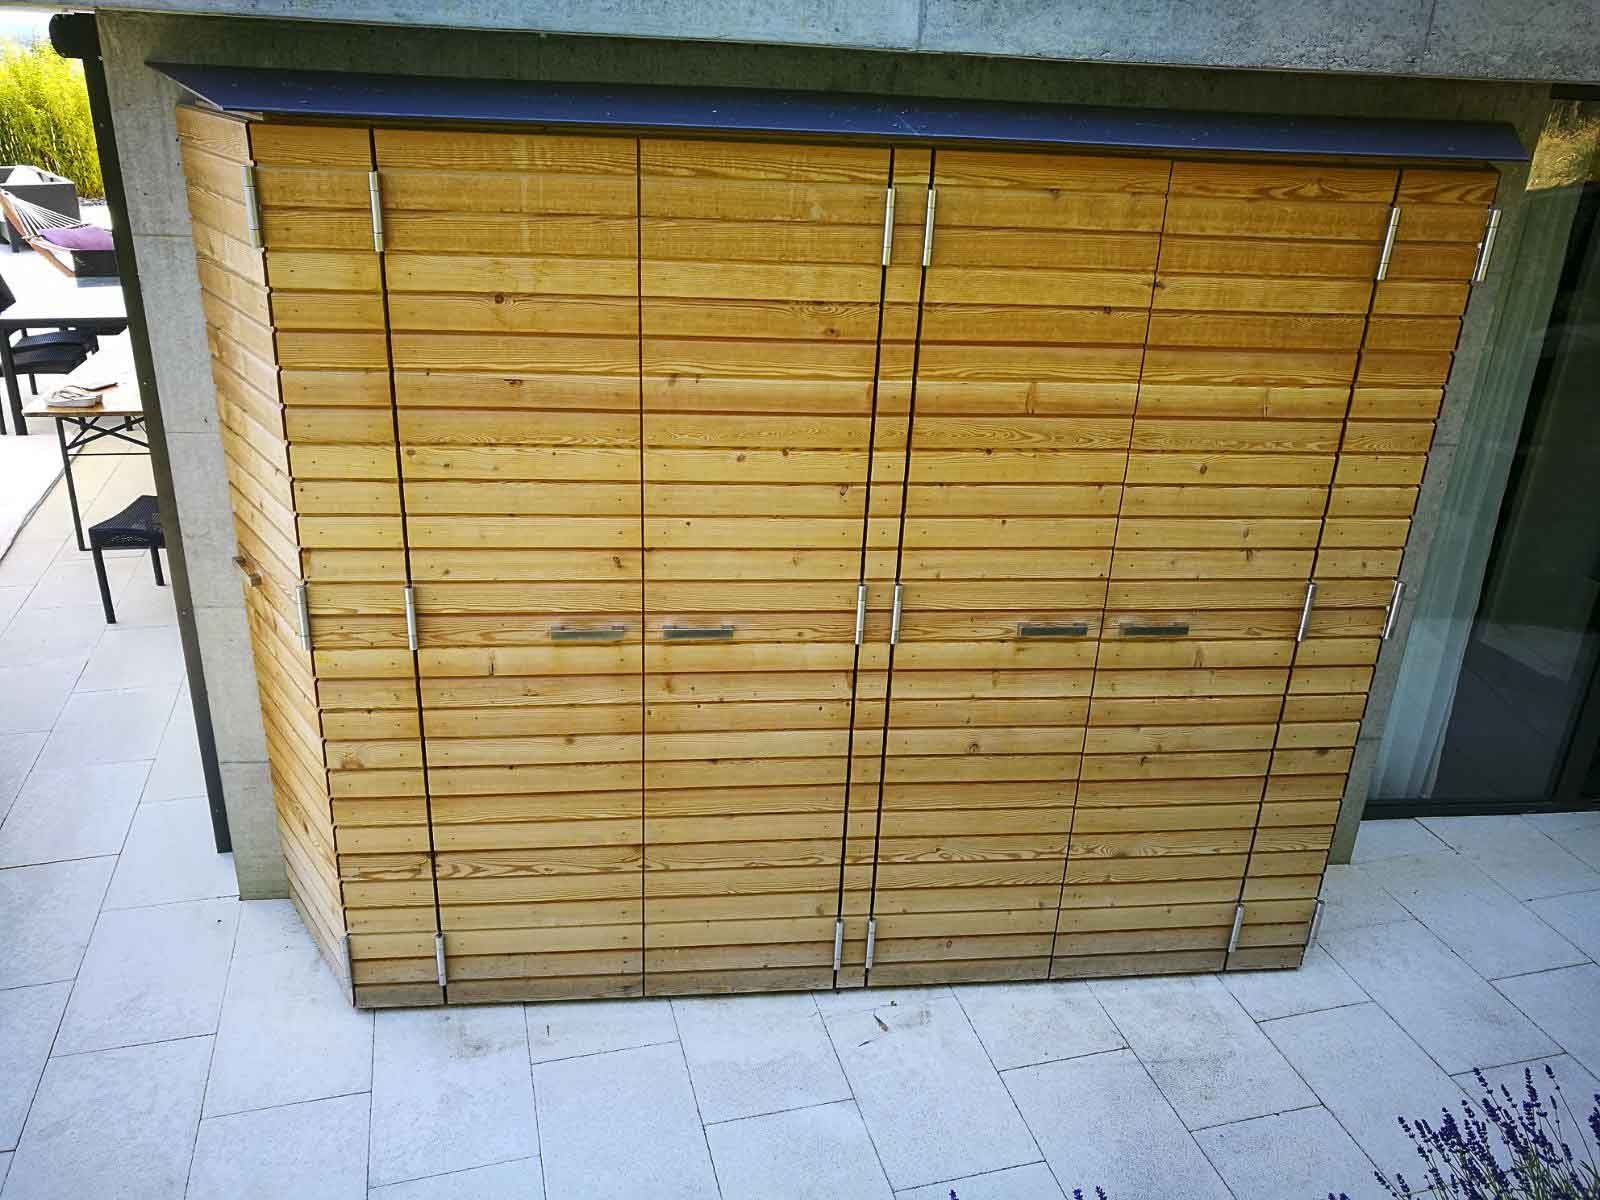 Wooddesign_Terrassengestaltung_Aussenschrank_Lärchenholz vergraut_Holzverschalung_Türen (2)